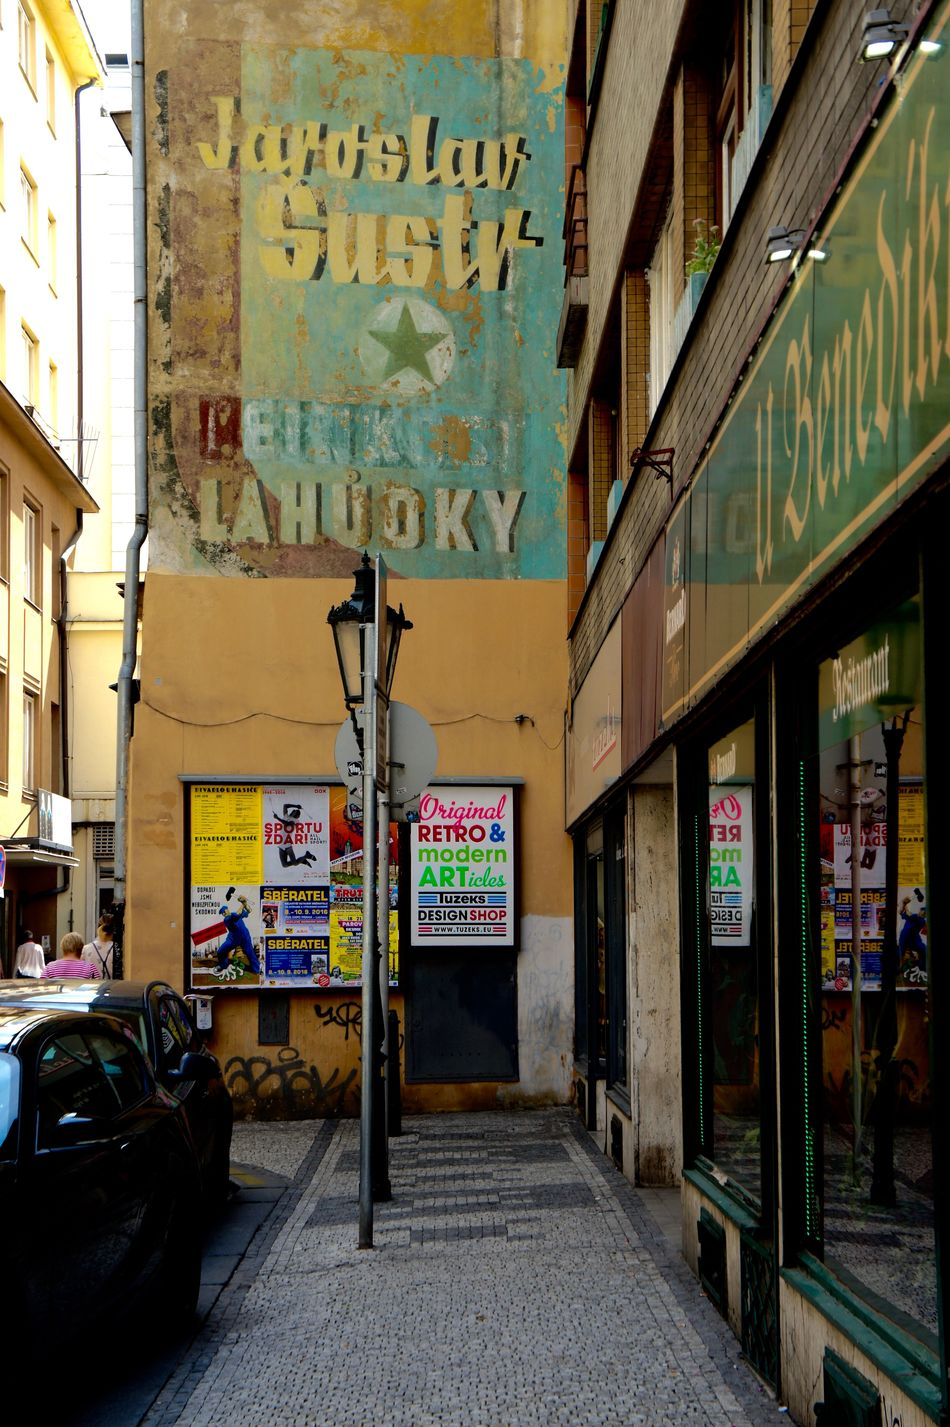 #advertisement #city Life #mural #Prague #retro #shabby Chic #street Light #streets #turquoise #urban #yellow